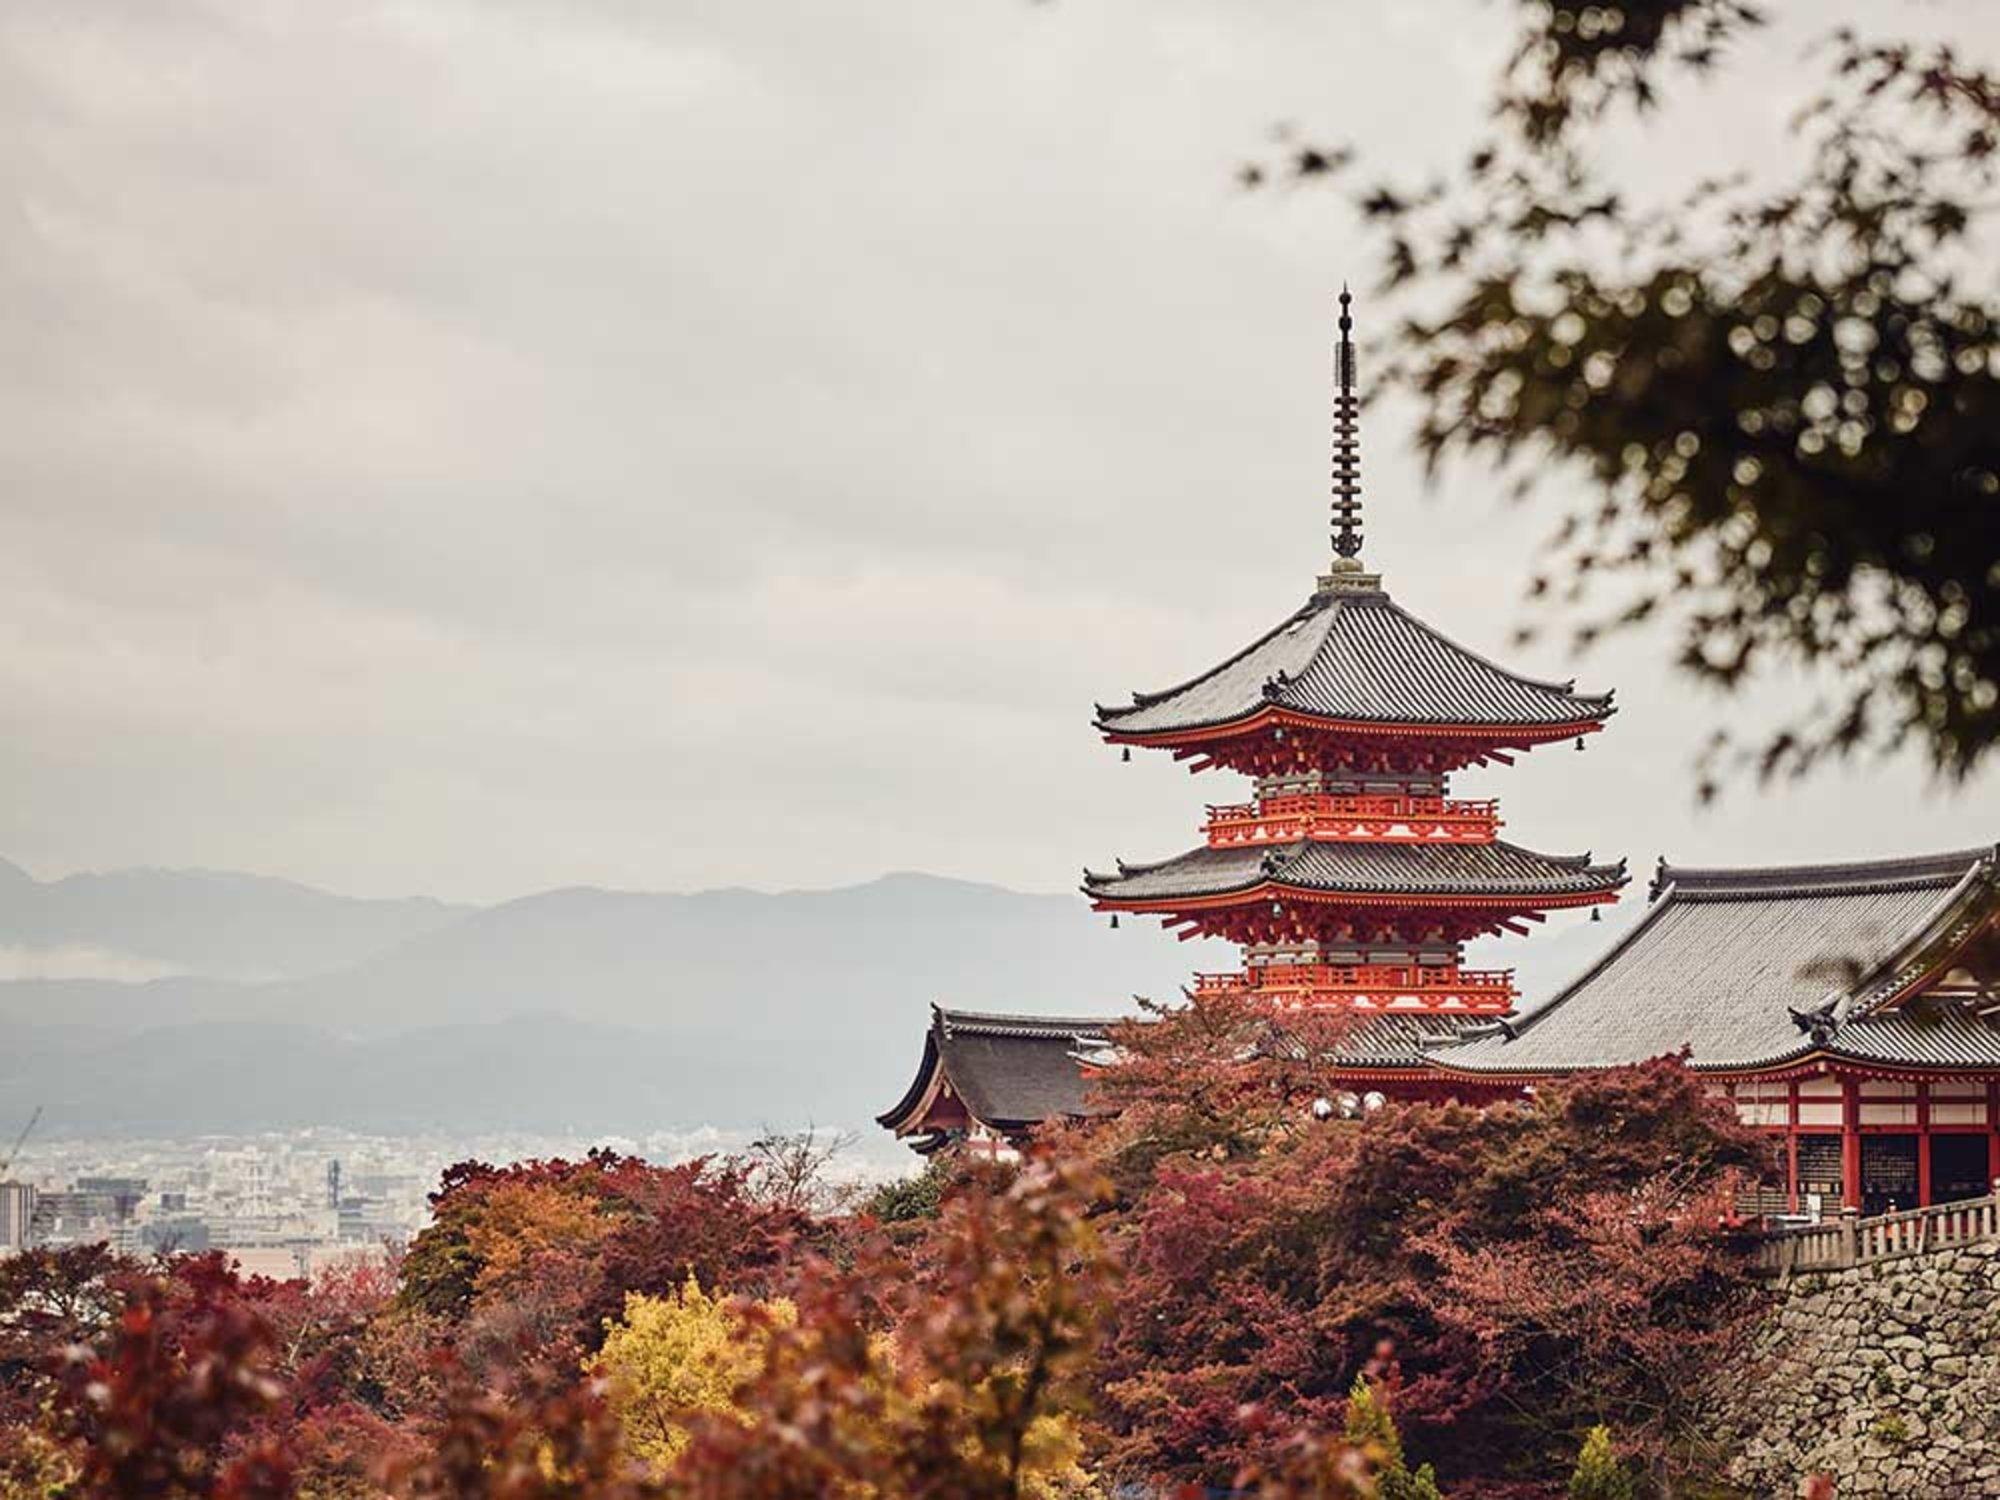 kyoto_temples-seasons1_1000x750.jpg